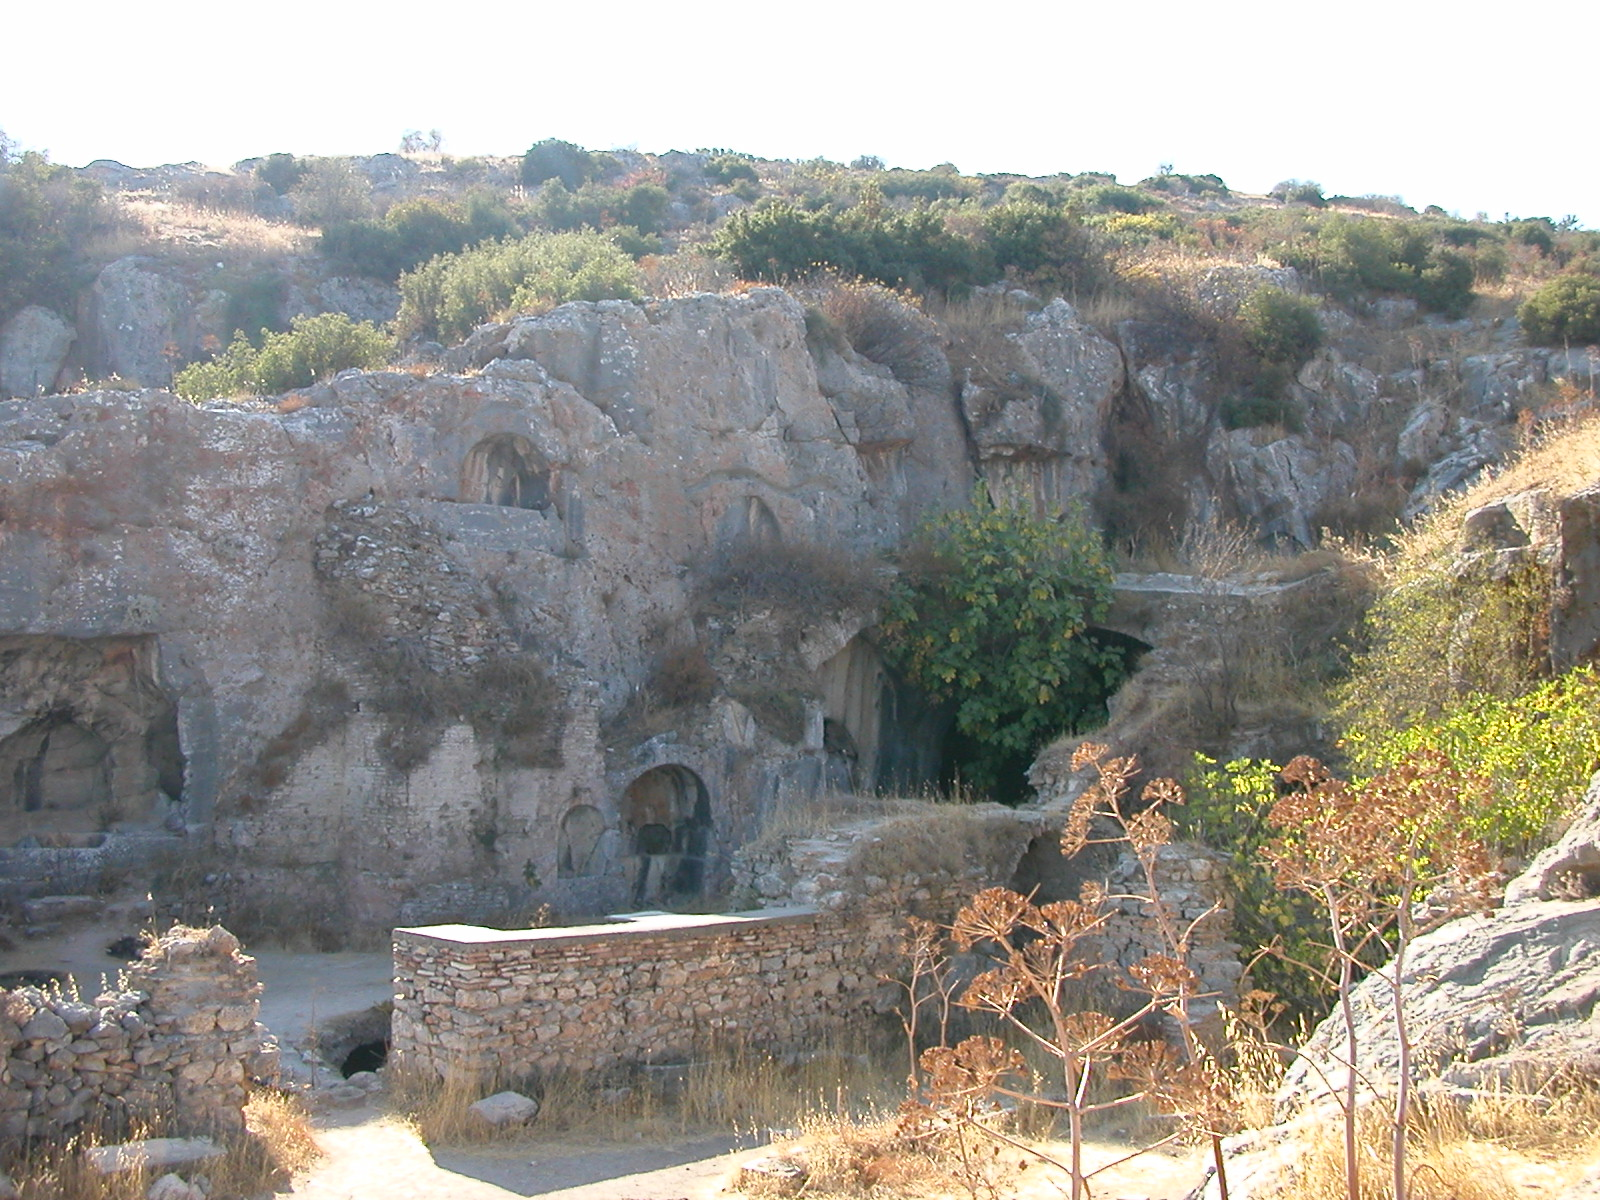 De Syv sovernes hule ved Efesos ble gjenoppdaget i 1928